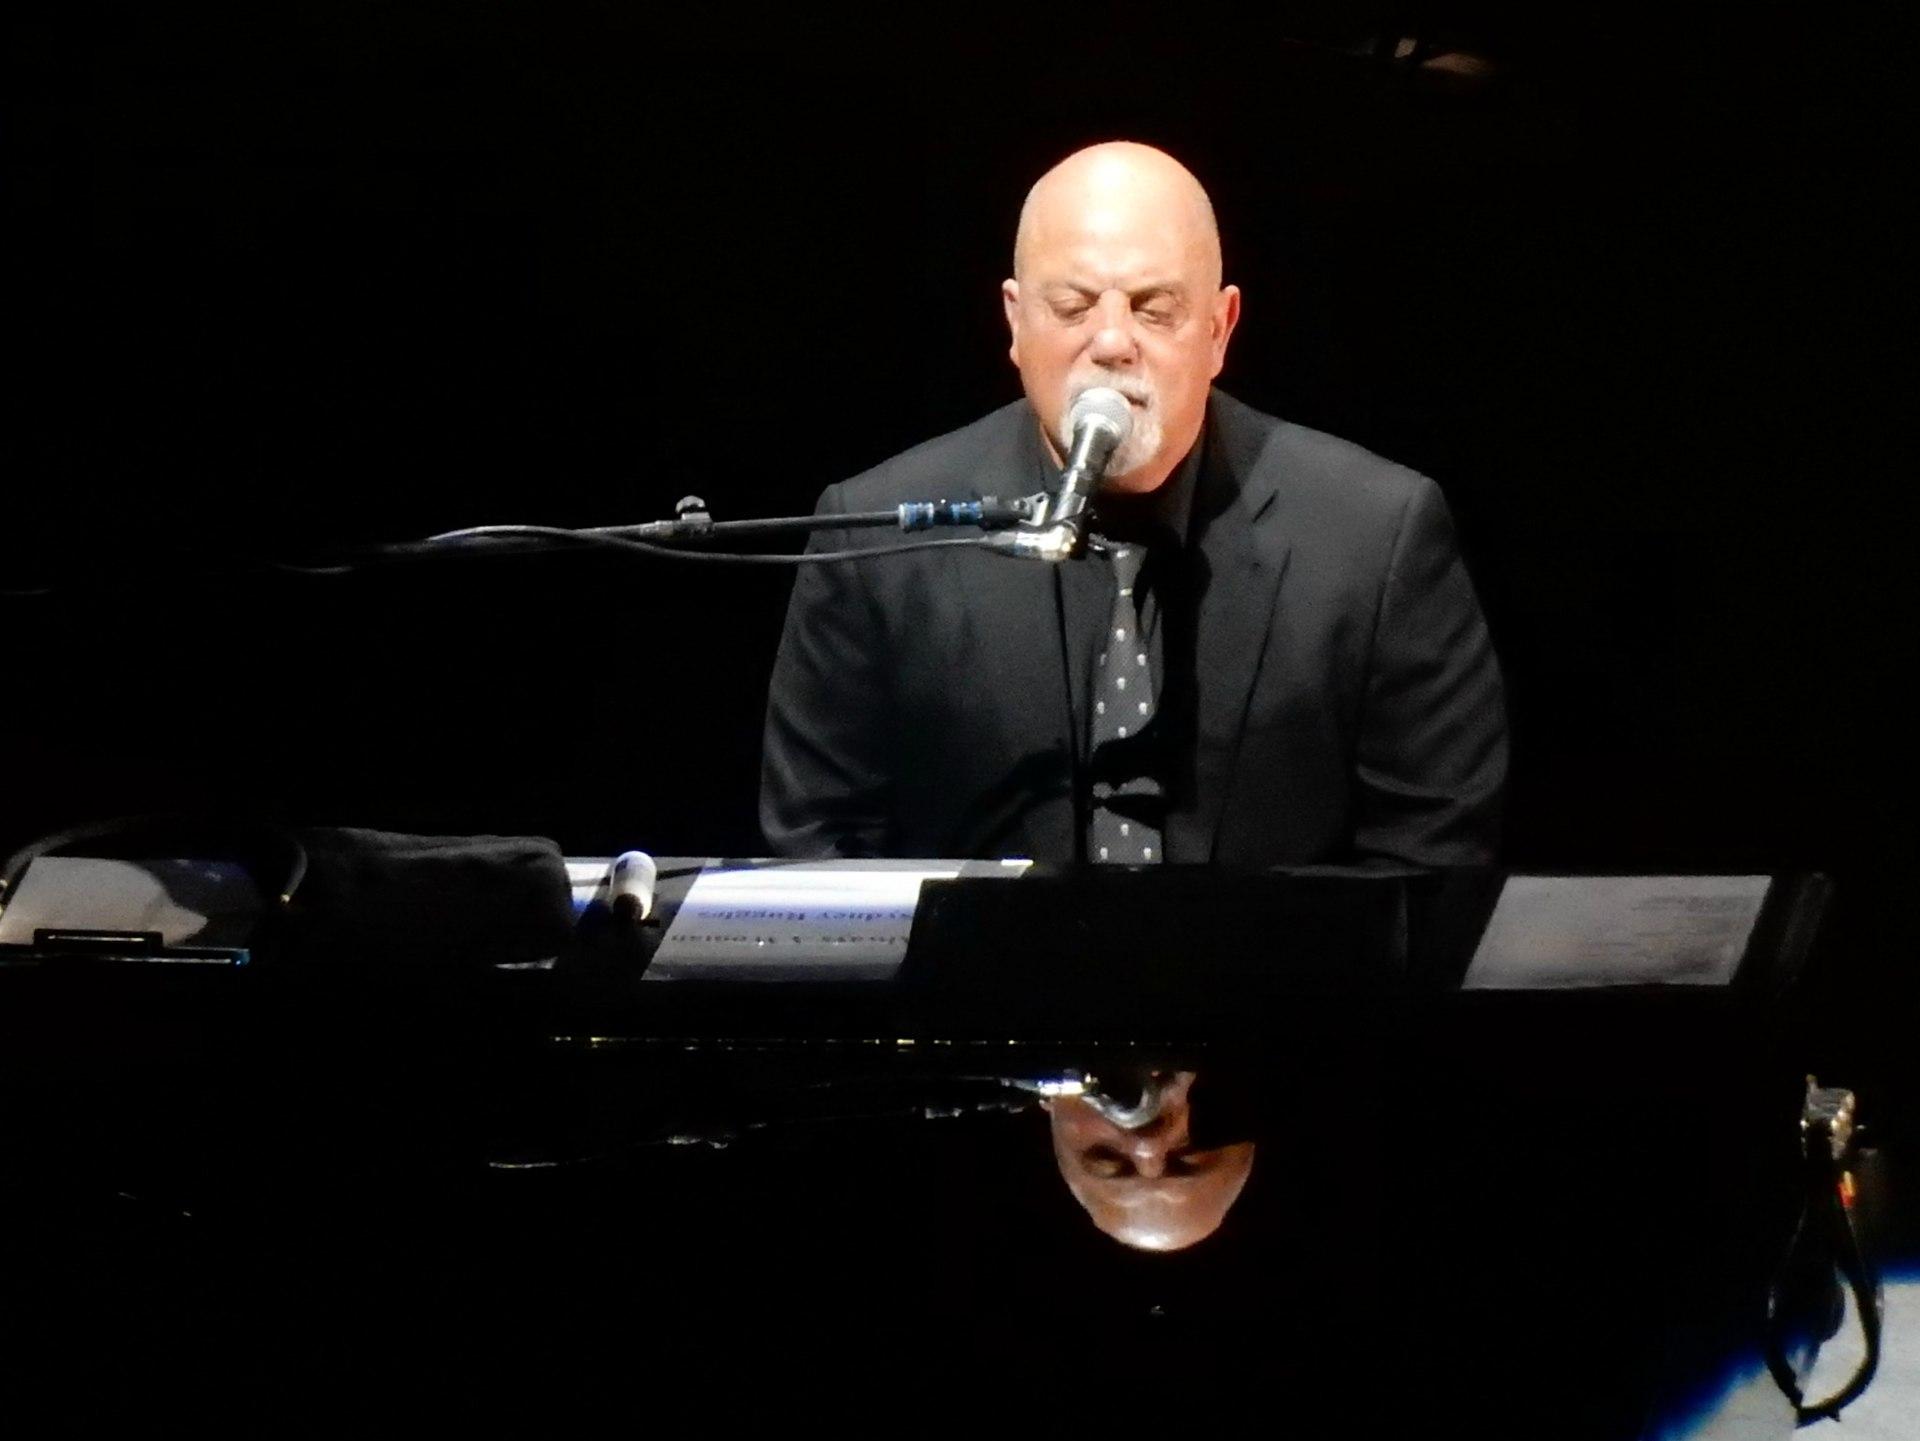 billy joel playing piano - photo #12